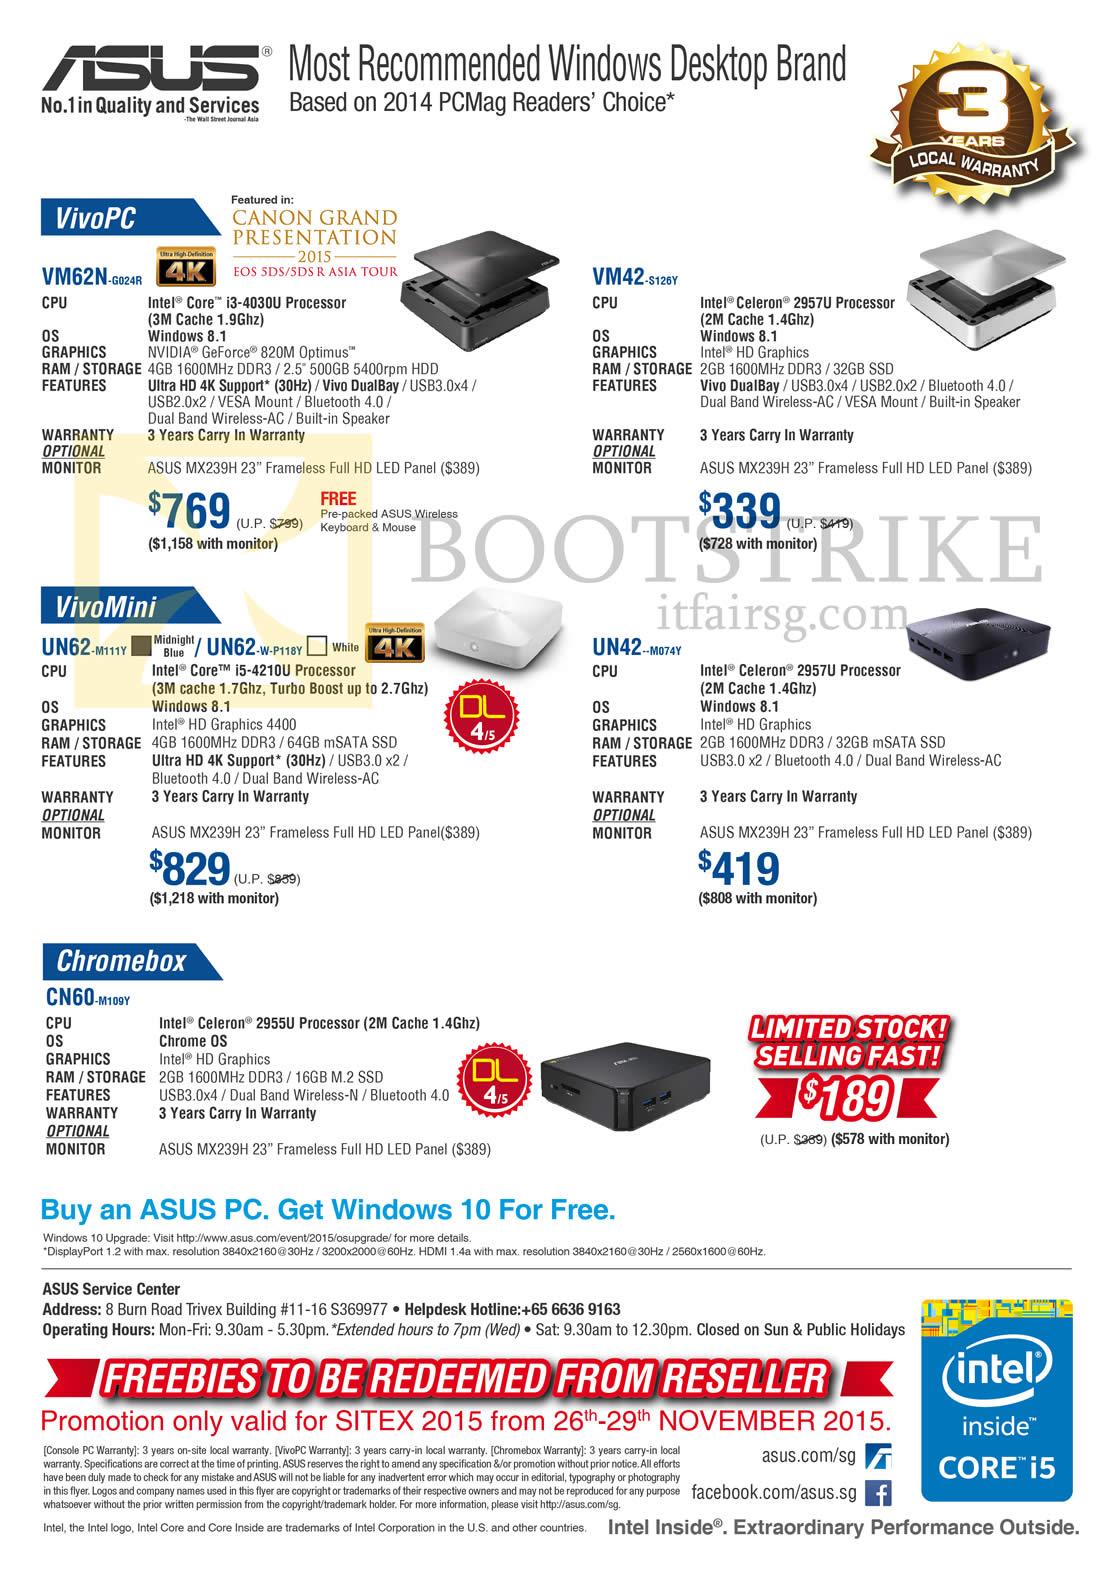 SITEX 2015 price list image brochure of ASUS Desktop PCs VM62N-G024R, VM42-S126Y, UN62-M111Y, UN62-WP118Y, UN42-M074Y, CN60-M109Y